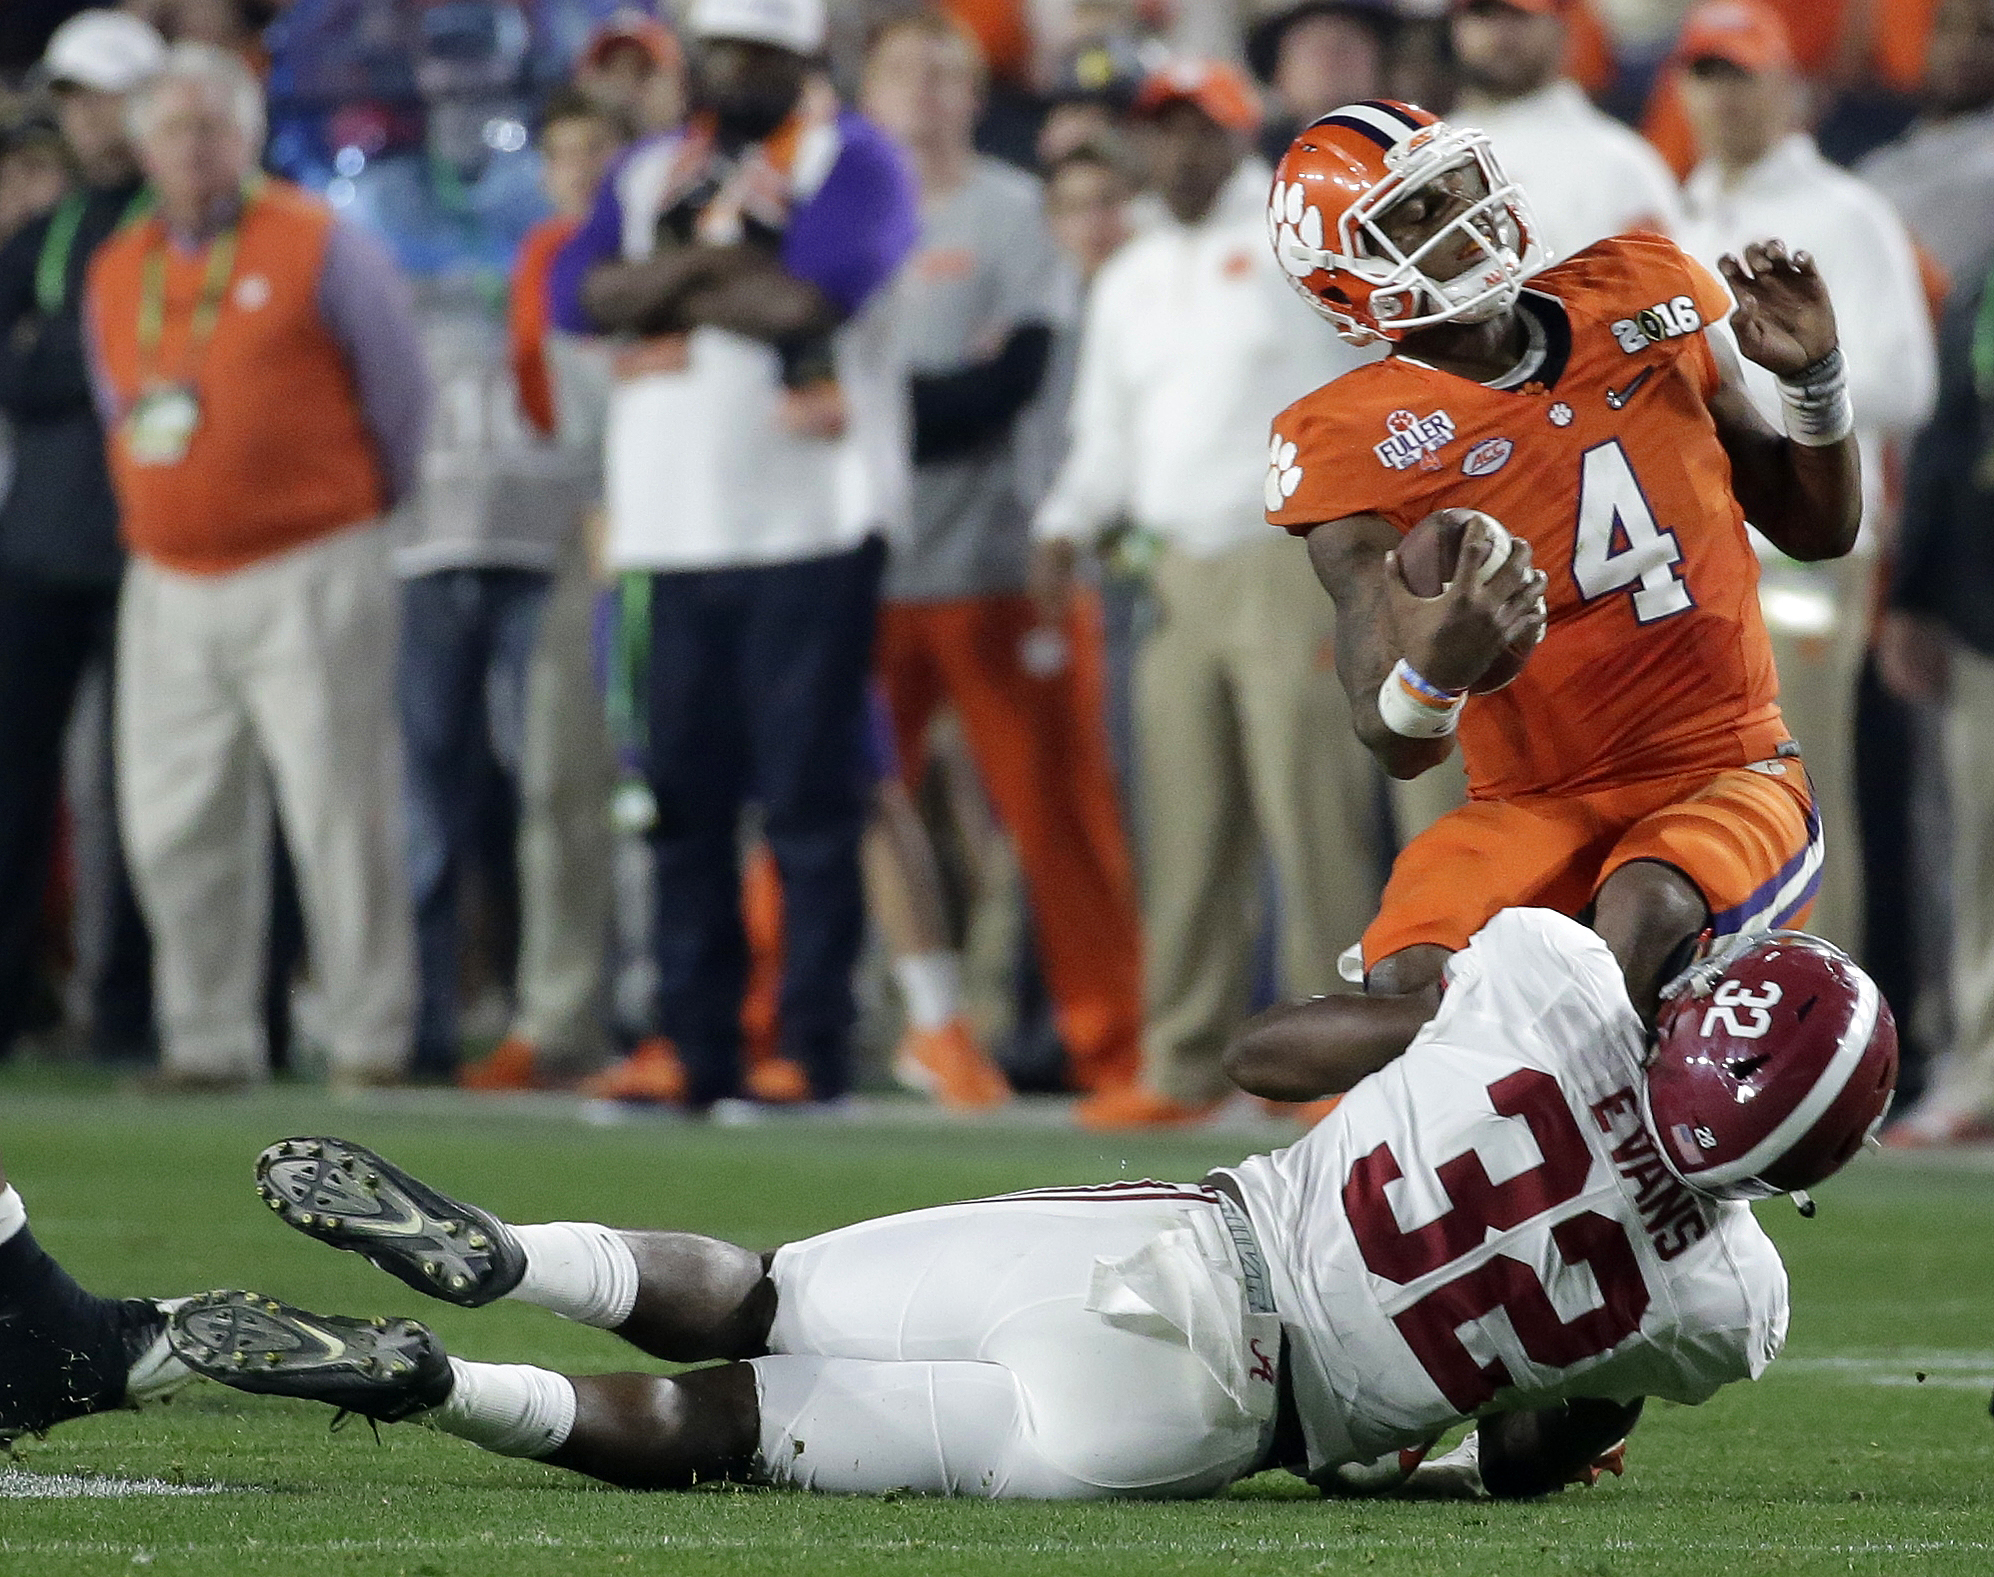 Alabama's Rashaan Evans (32) sacks Clemson quarterback Deshaun Watson during the second half of the NCAA college football playoff championship game Monday, Jan. 11, 2016, in Glendale, Ariz. (AP Photo/Chris Carlson)